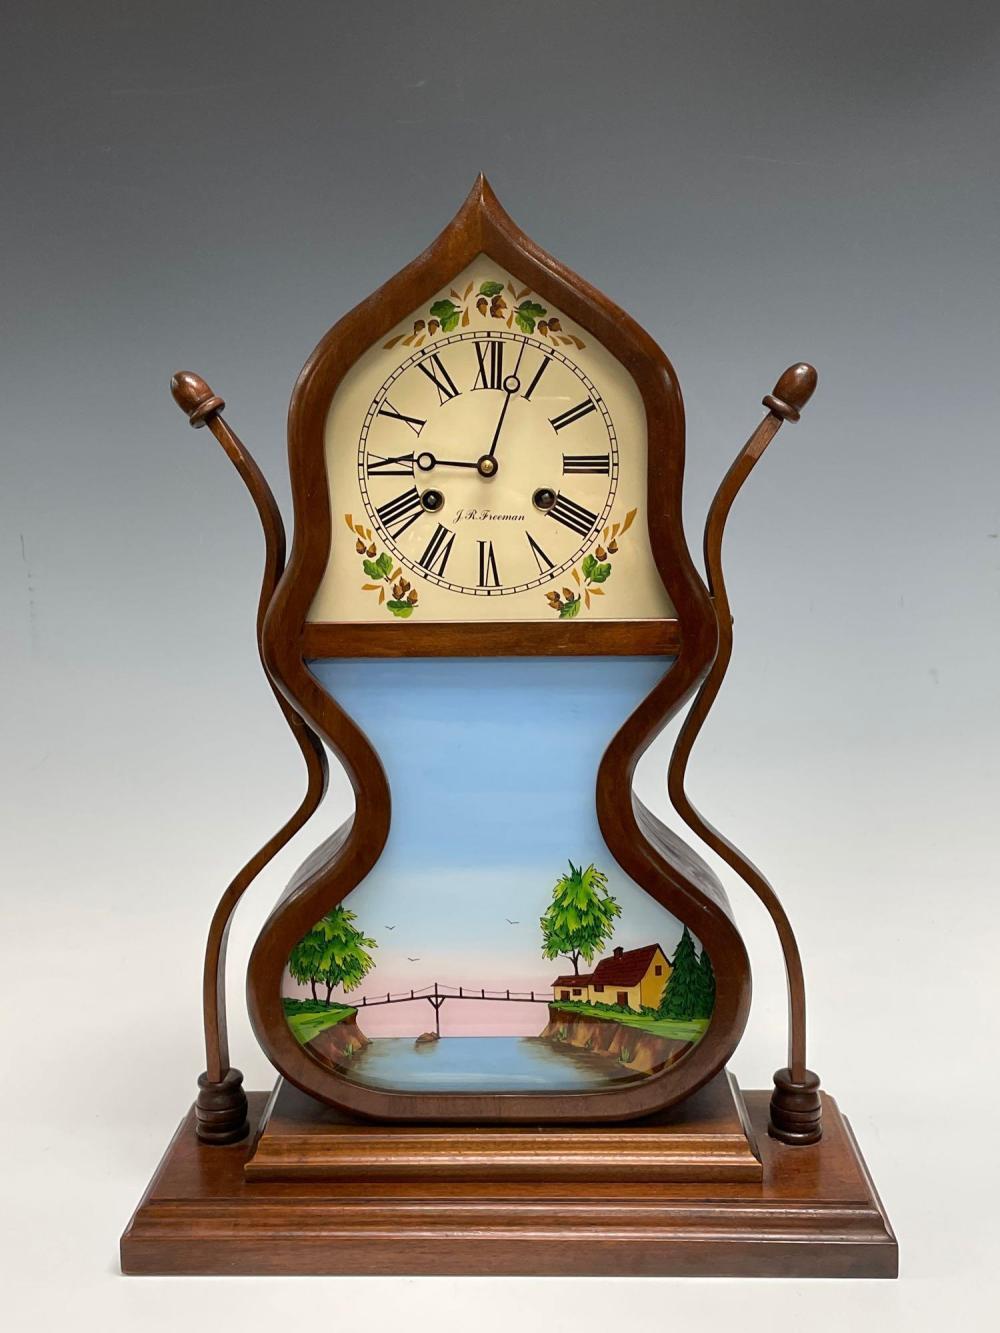 J C Brown Style Acorn Shelf Clock by J.R. Freeman